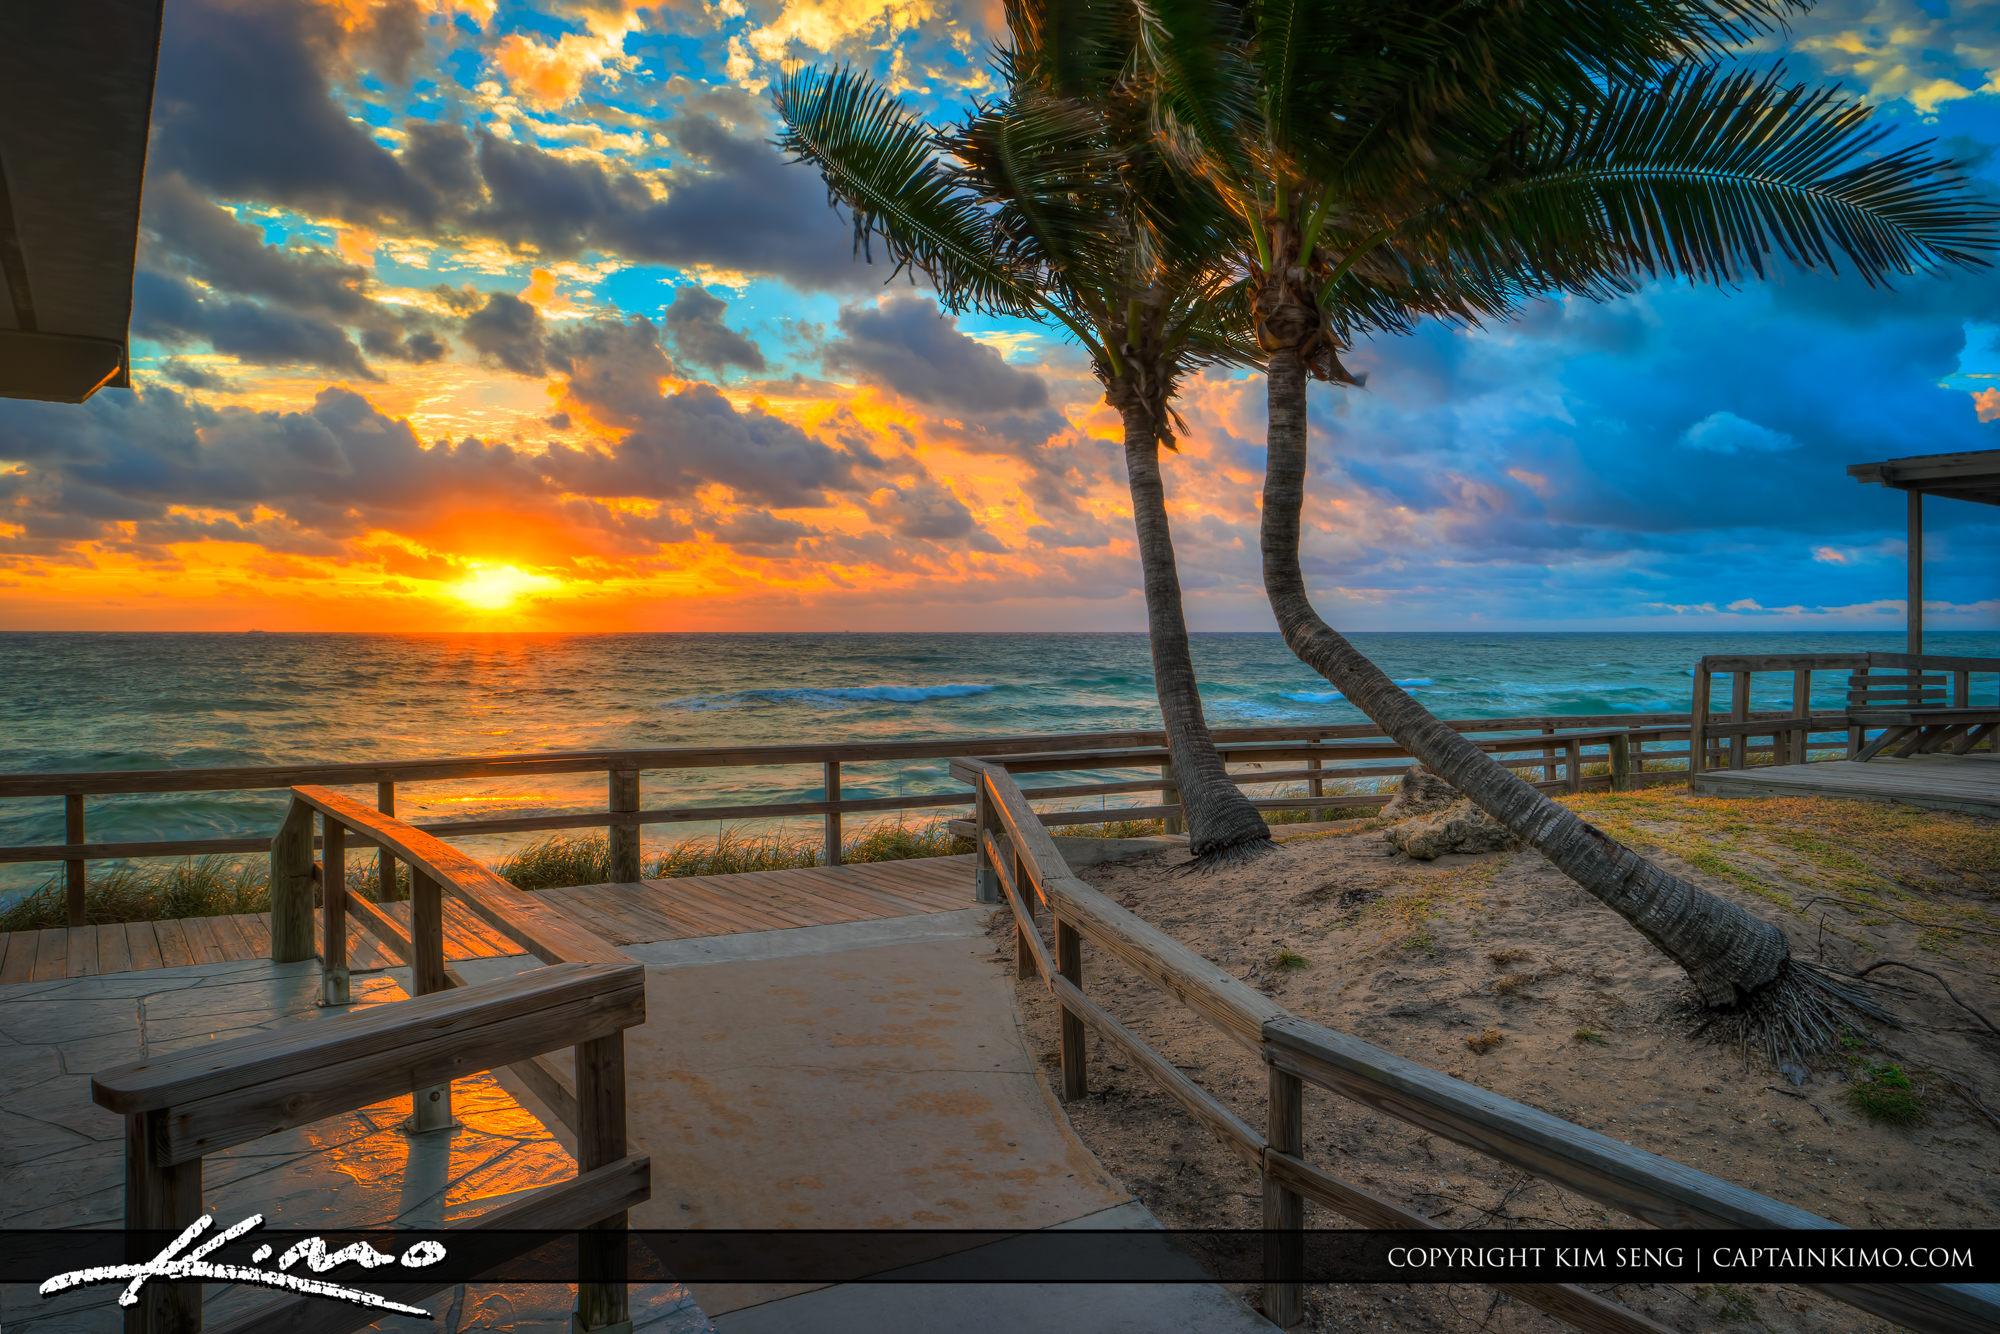 Lantana Beach Sunrise with Coconut Trees